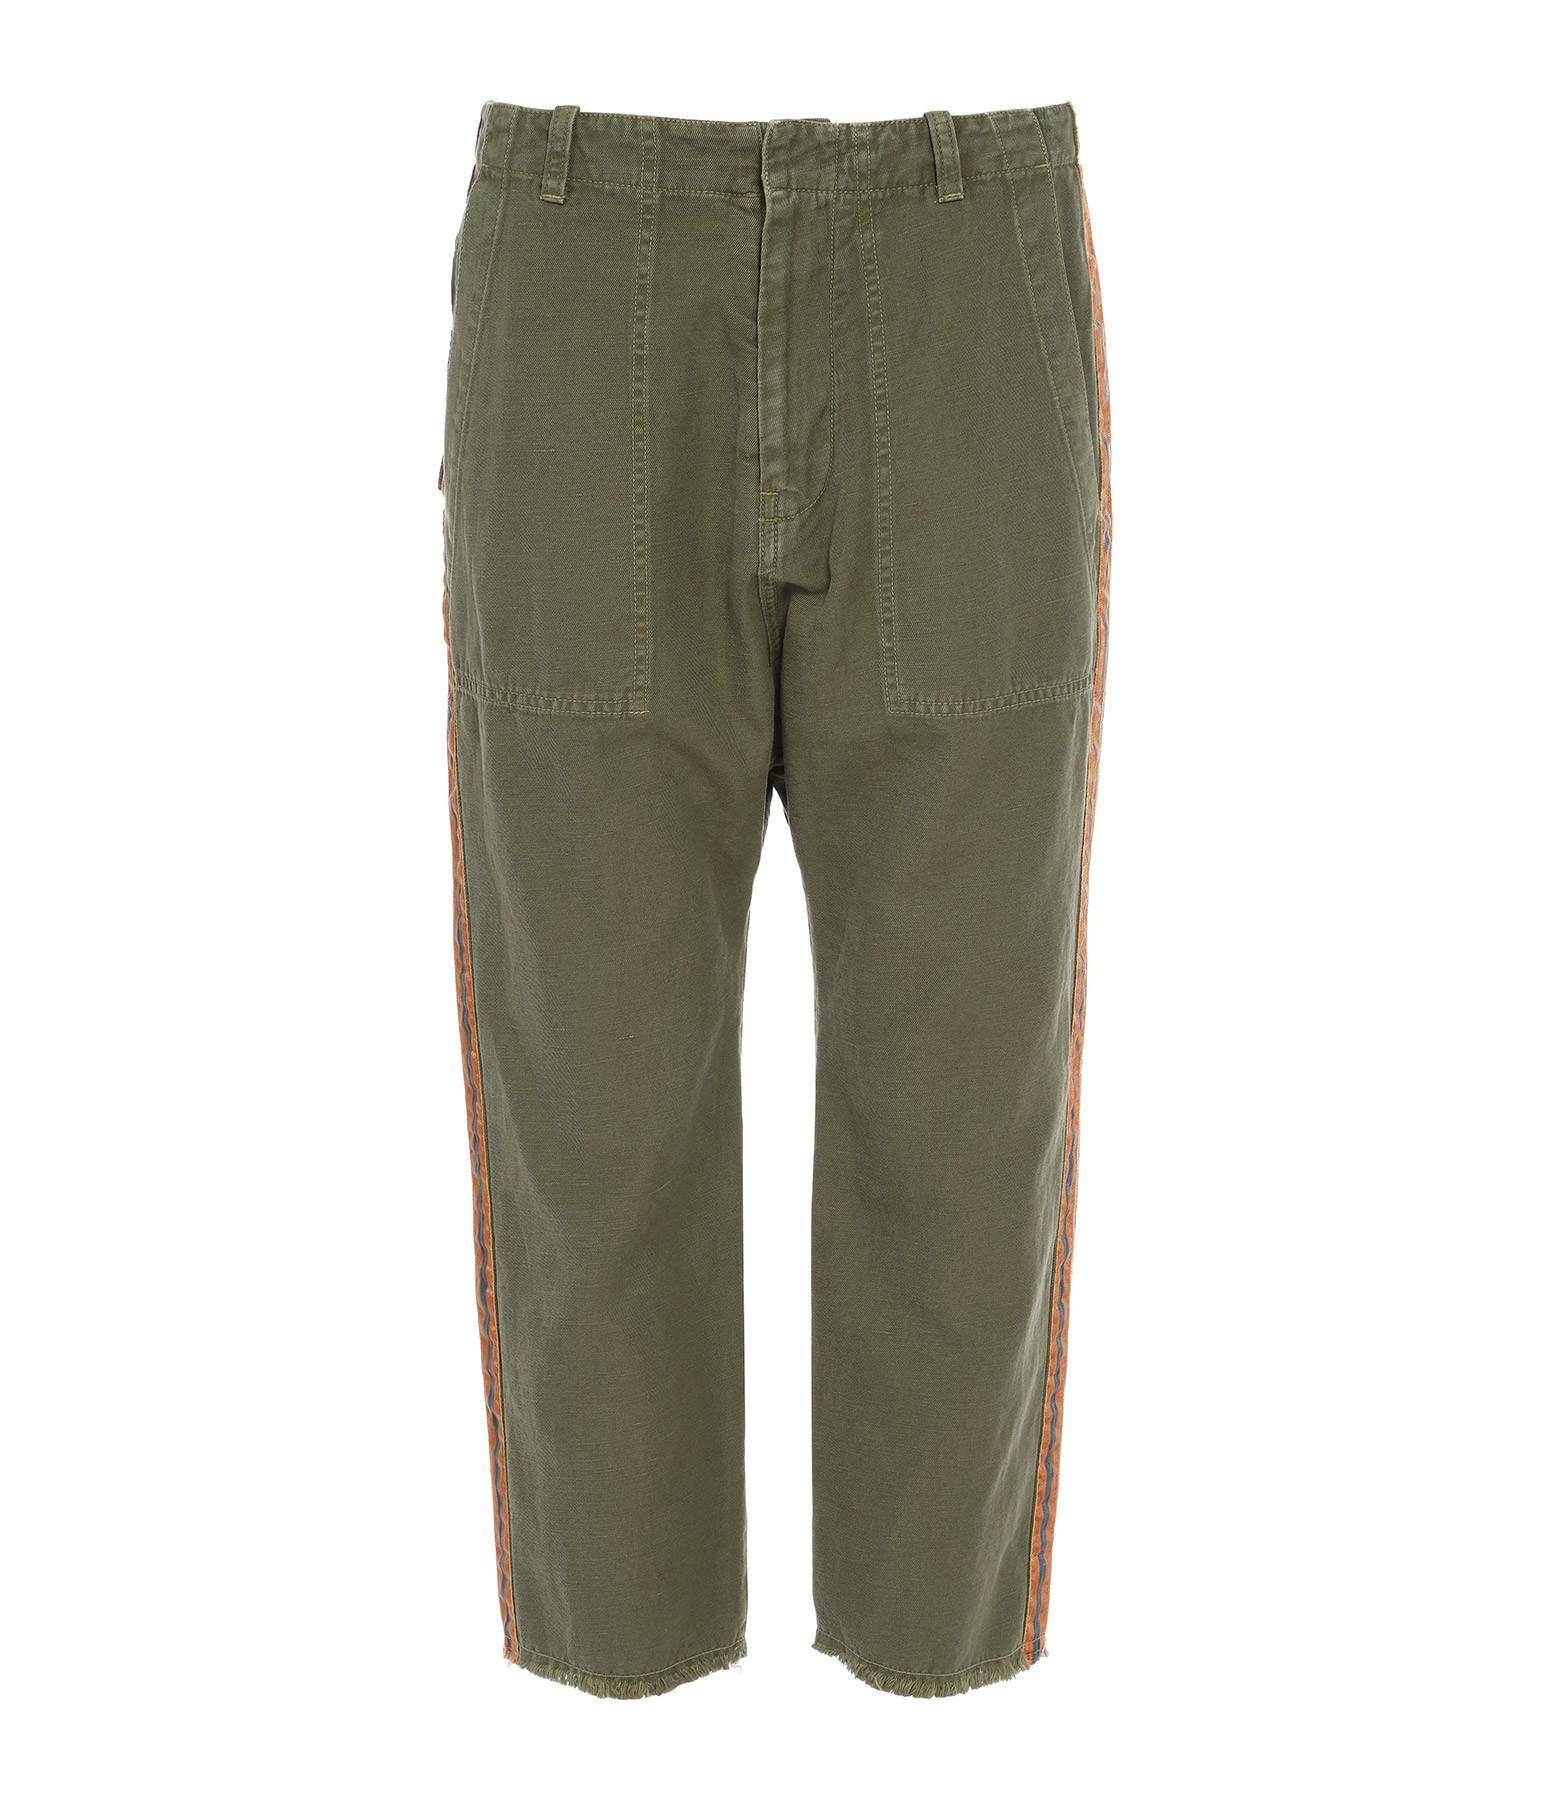 NILI LOTAN - Pantalon Luna Bandes Vert Orange